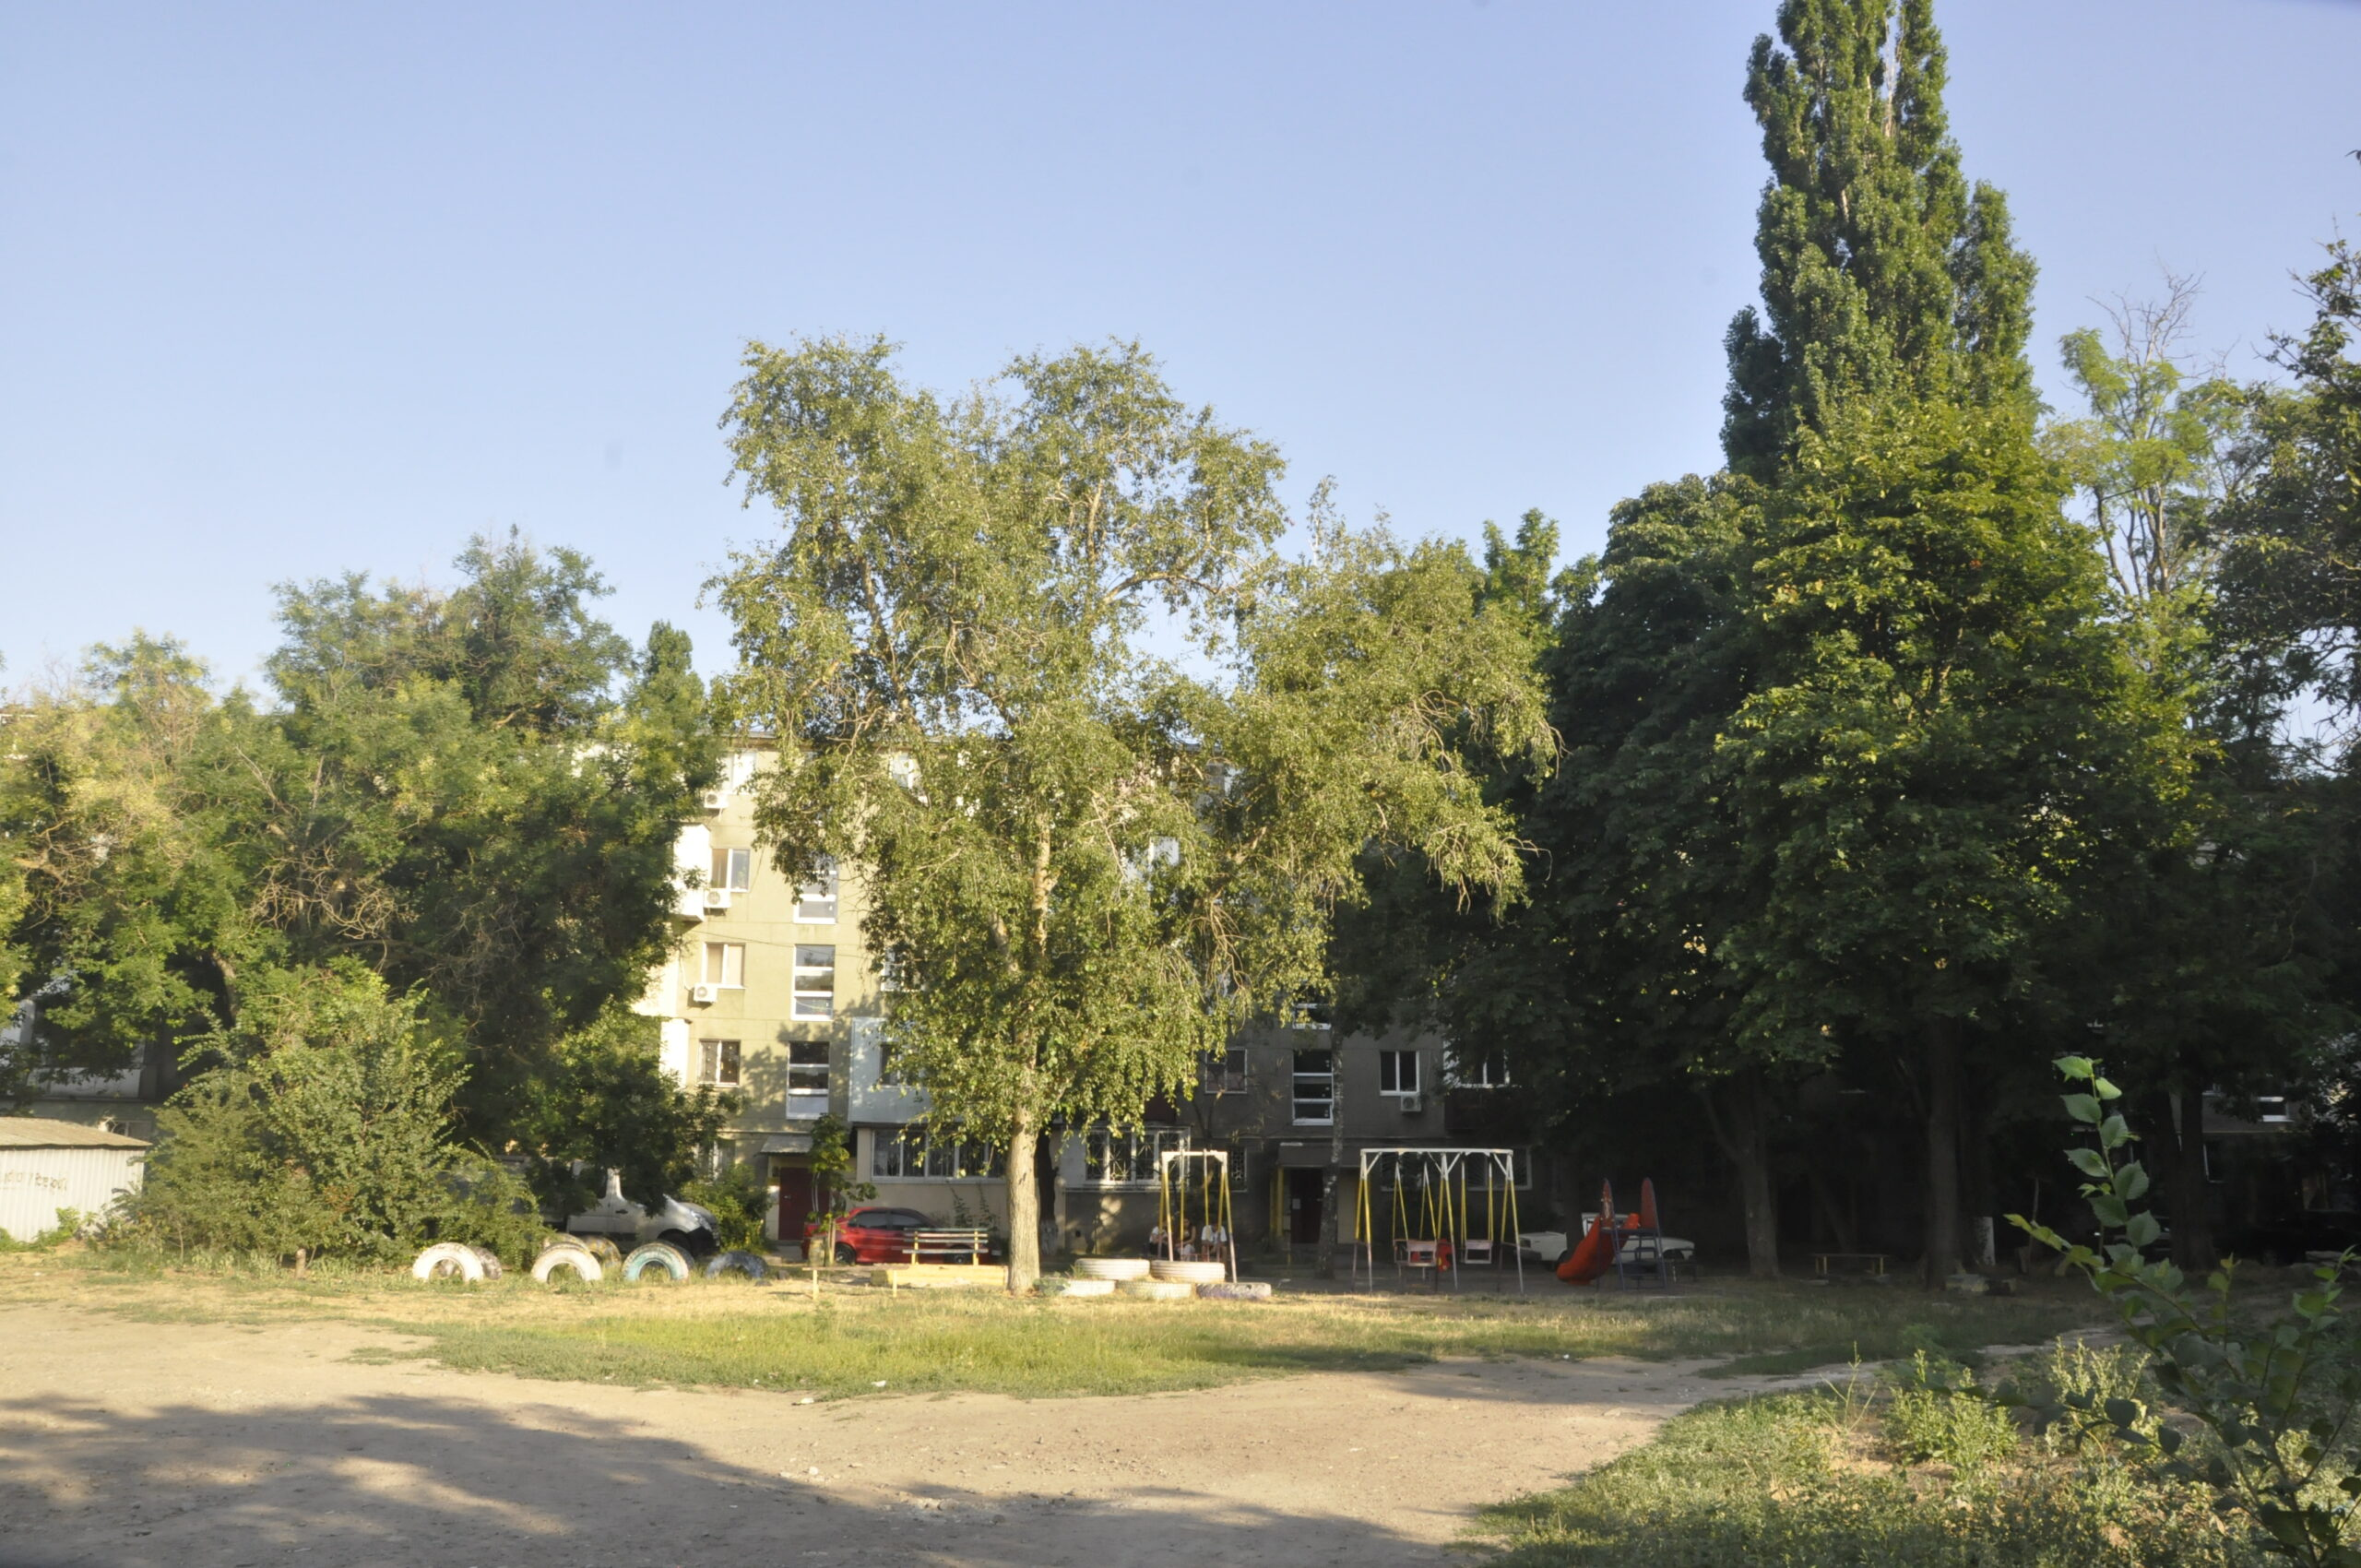 Махачкалинская: улица без улицы